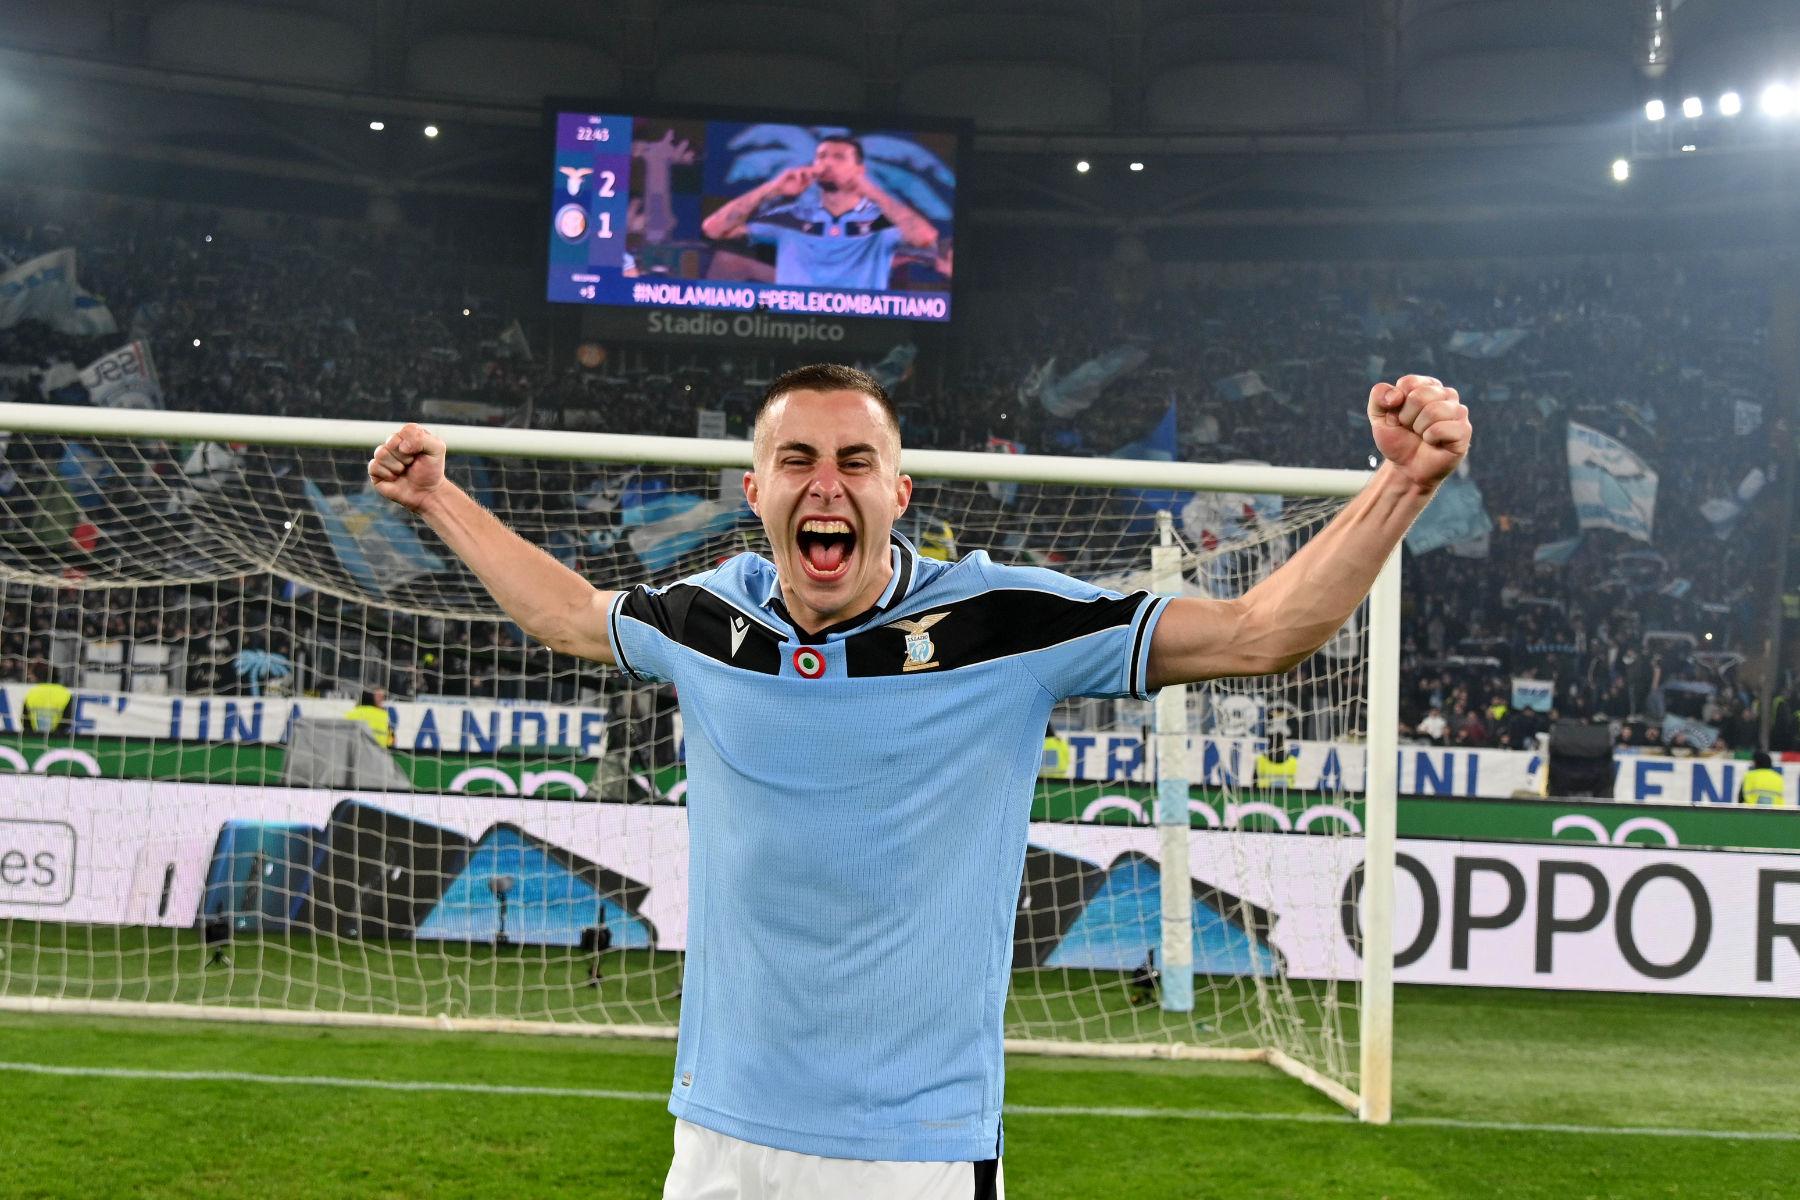 Report: PSG Targeting Lazio's Adam Marušić to Fill Right-Back Position -  PSG Talk